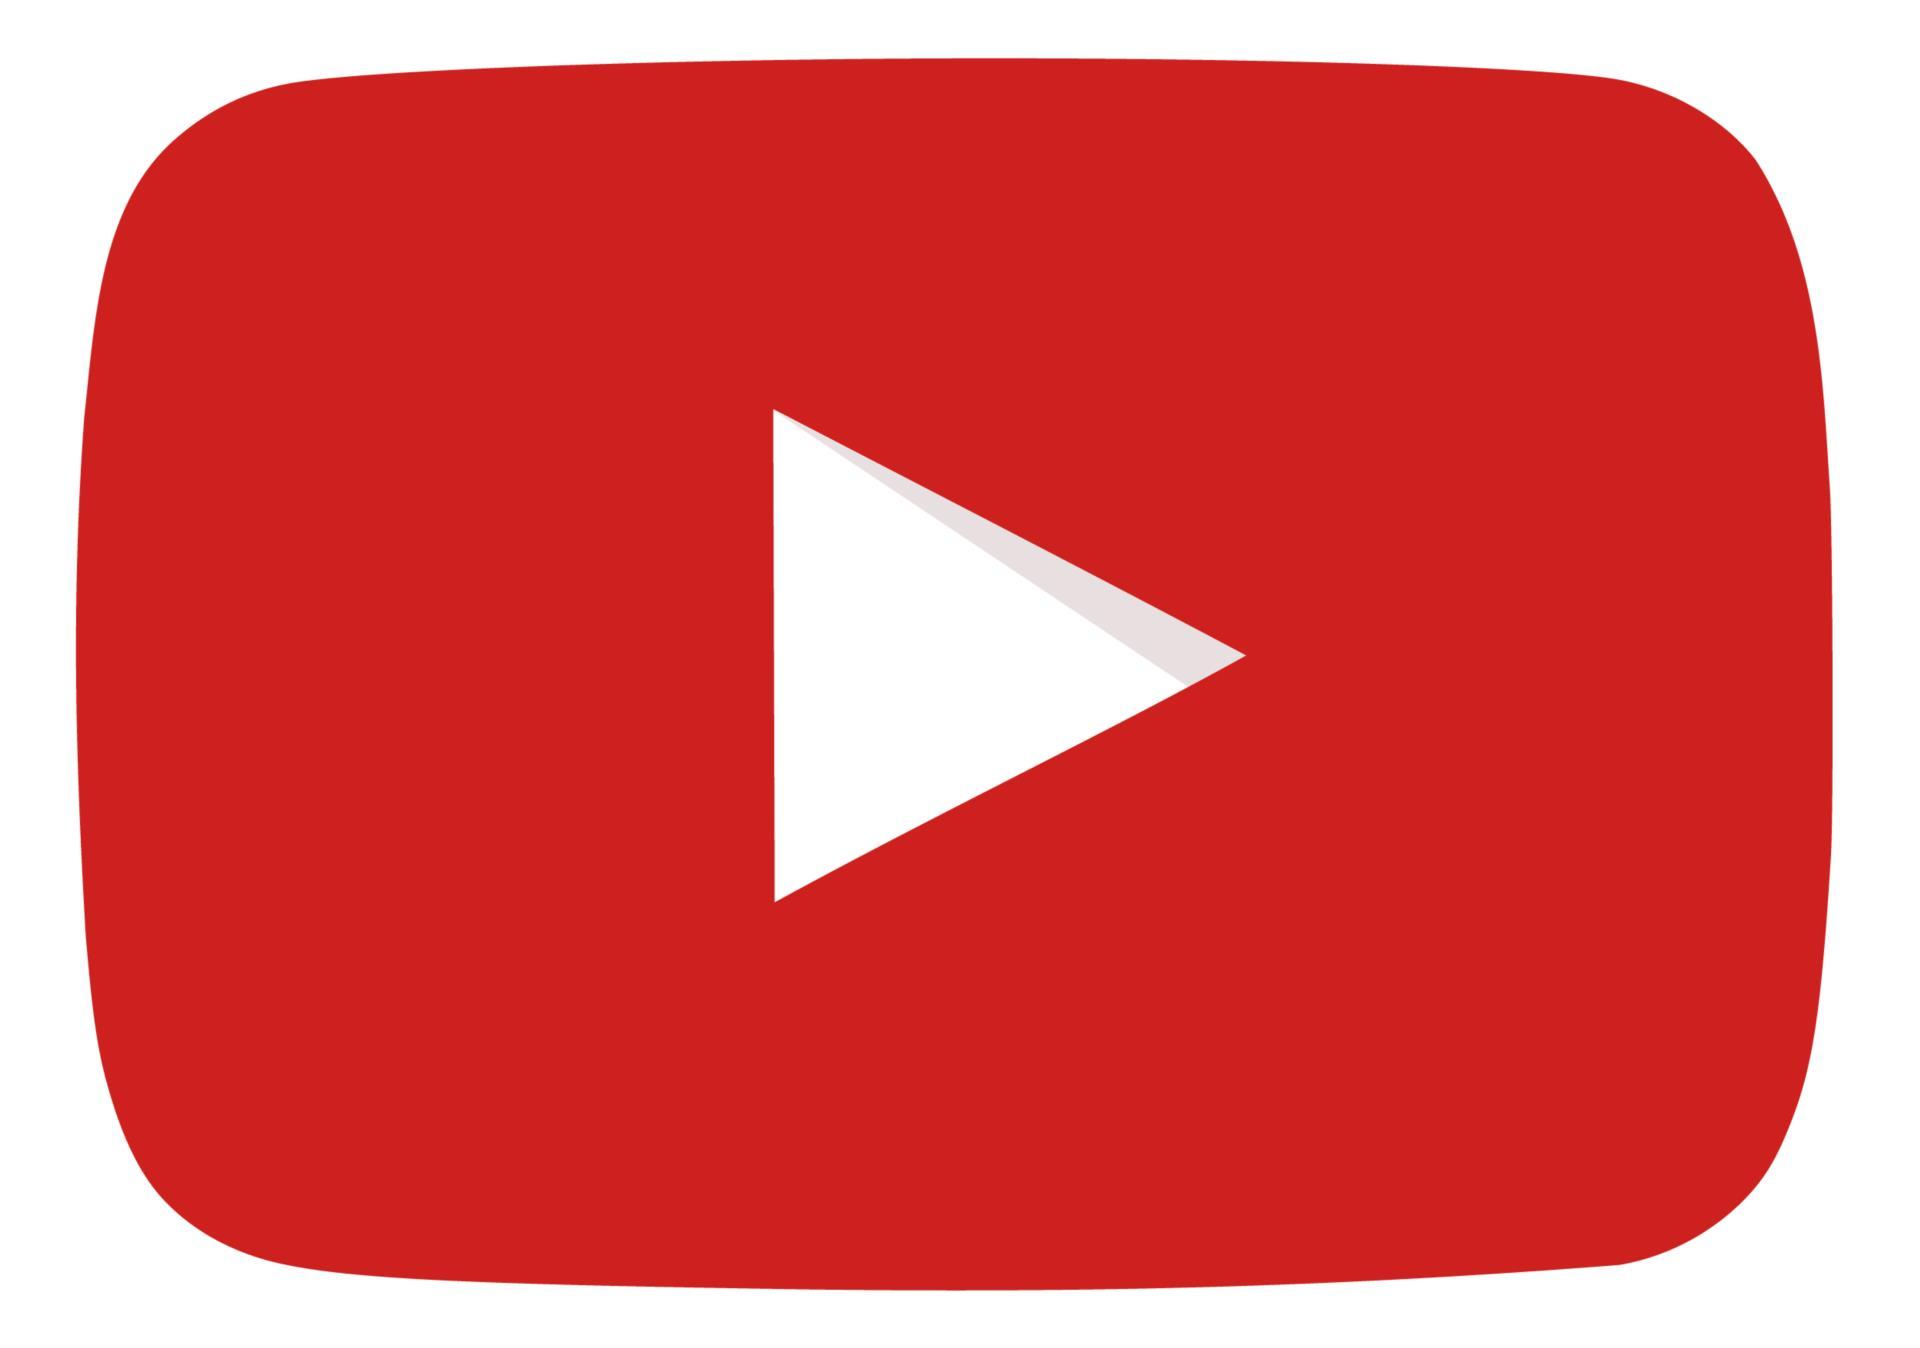 CVCC on YouTube